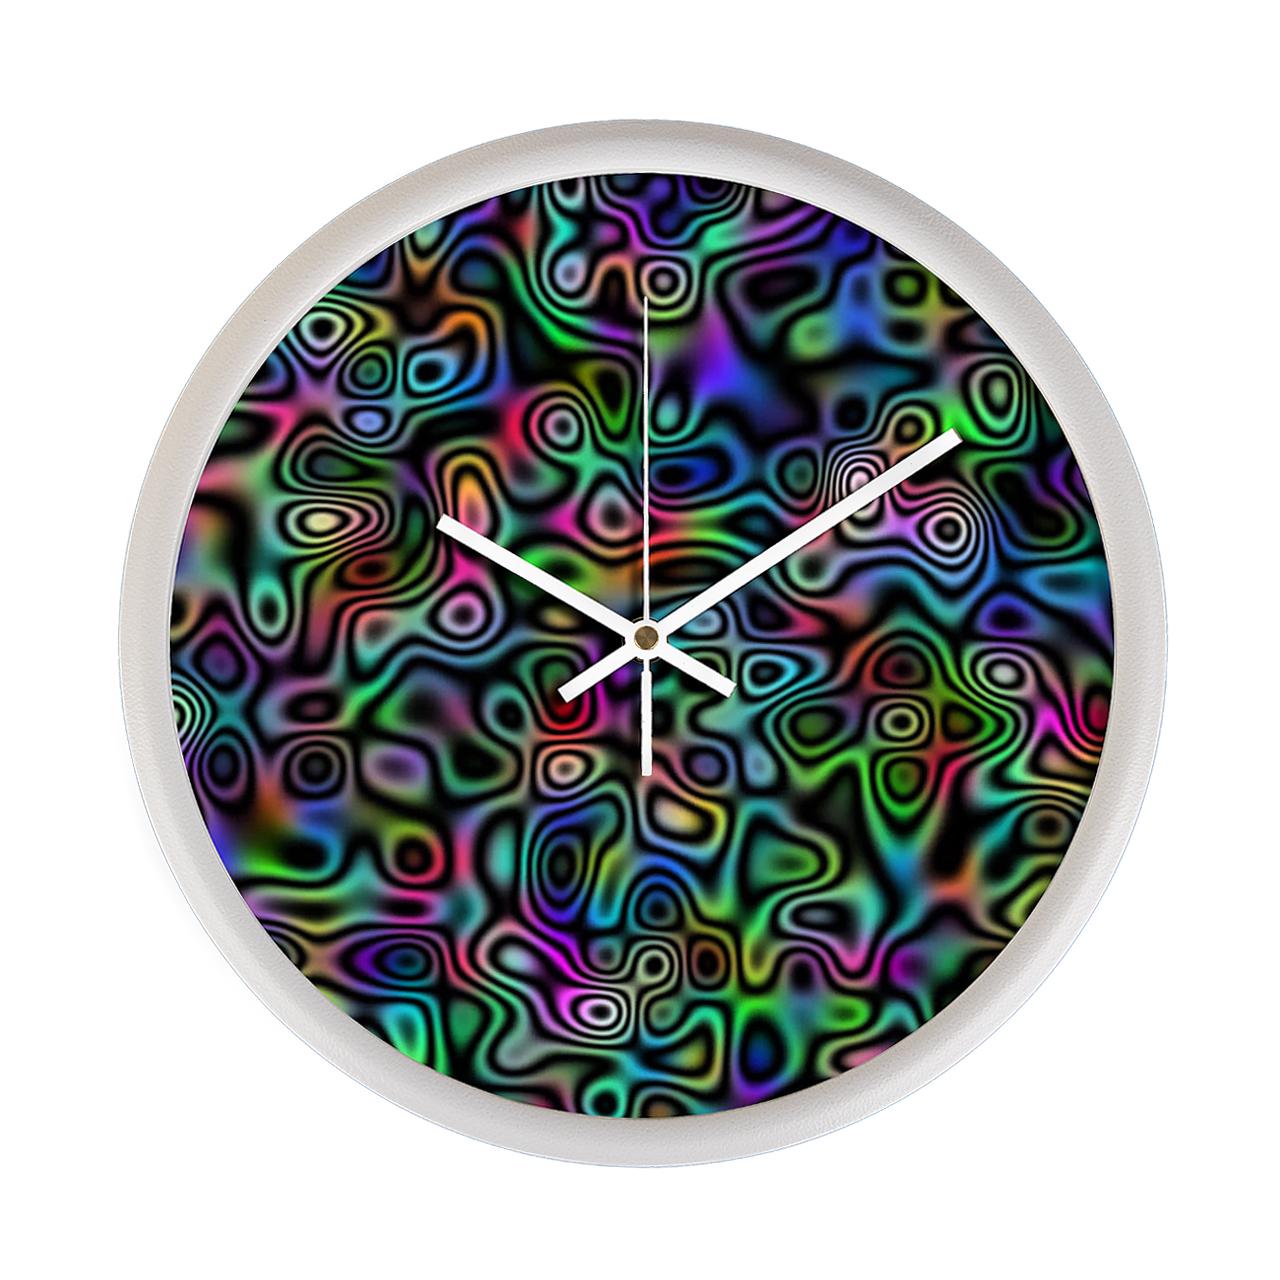 ساعت دیواری مینی مال لاکچری مدل 35Dio3_0120